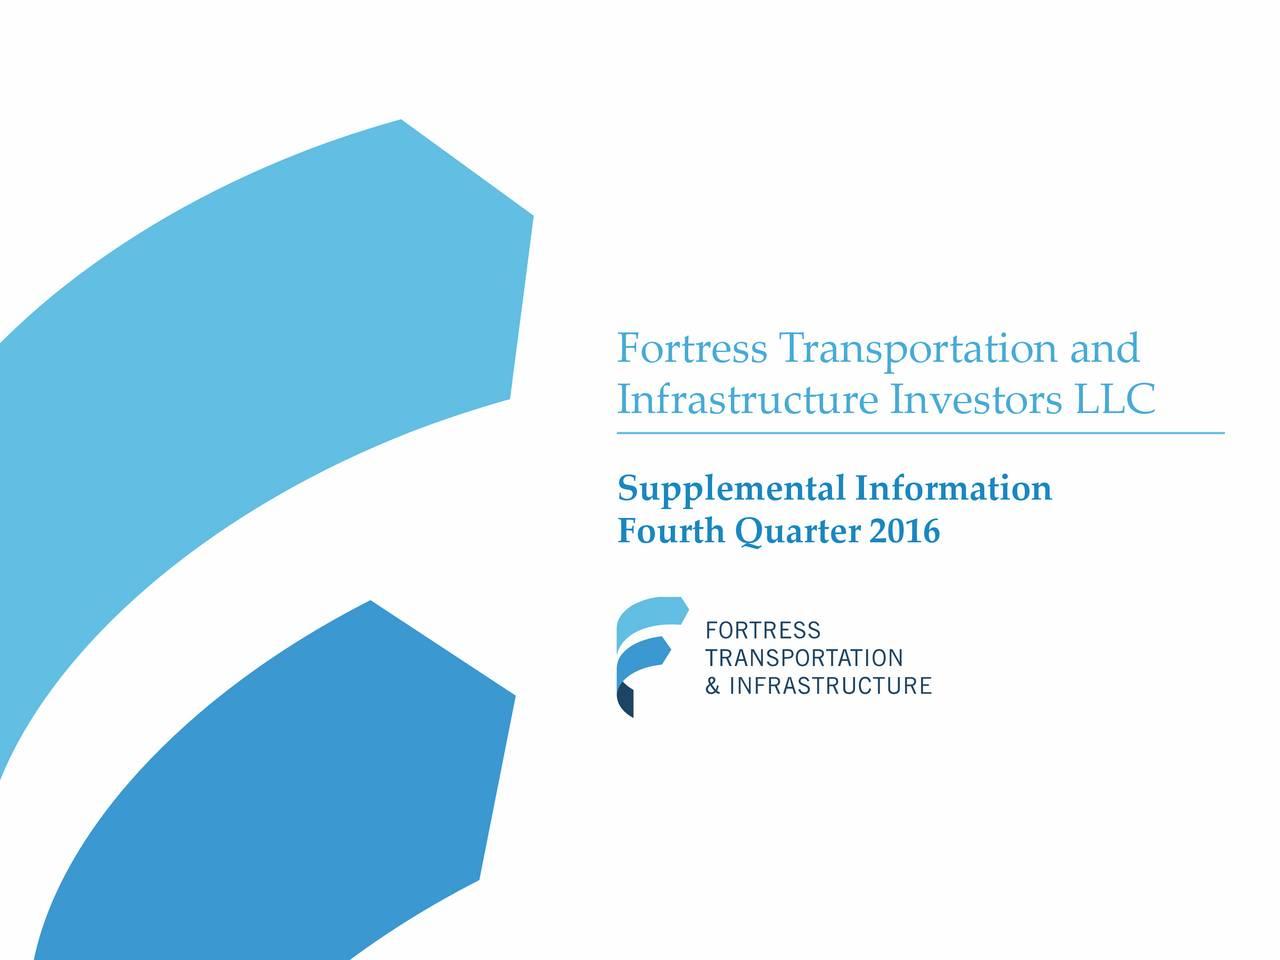 Infrastructure Investors LLC Supplemental Information Fourth Quarter 2016